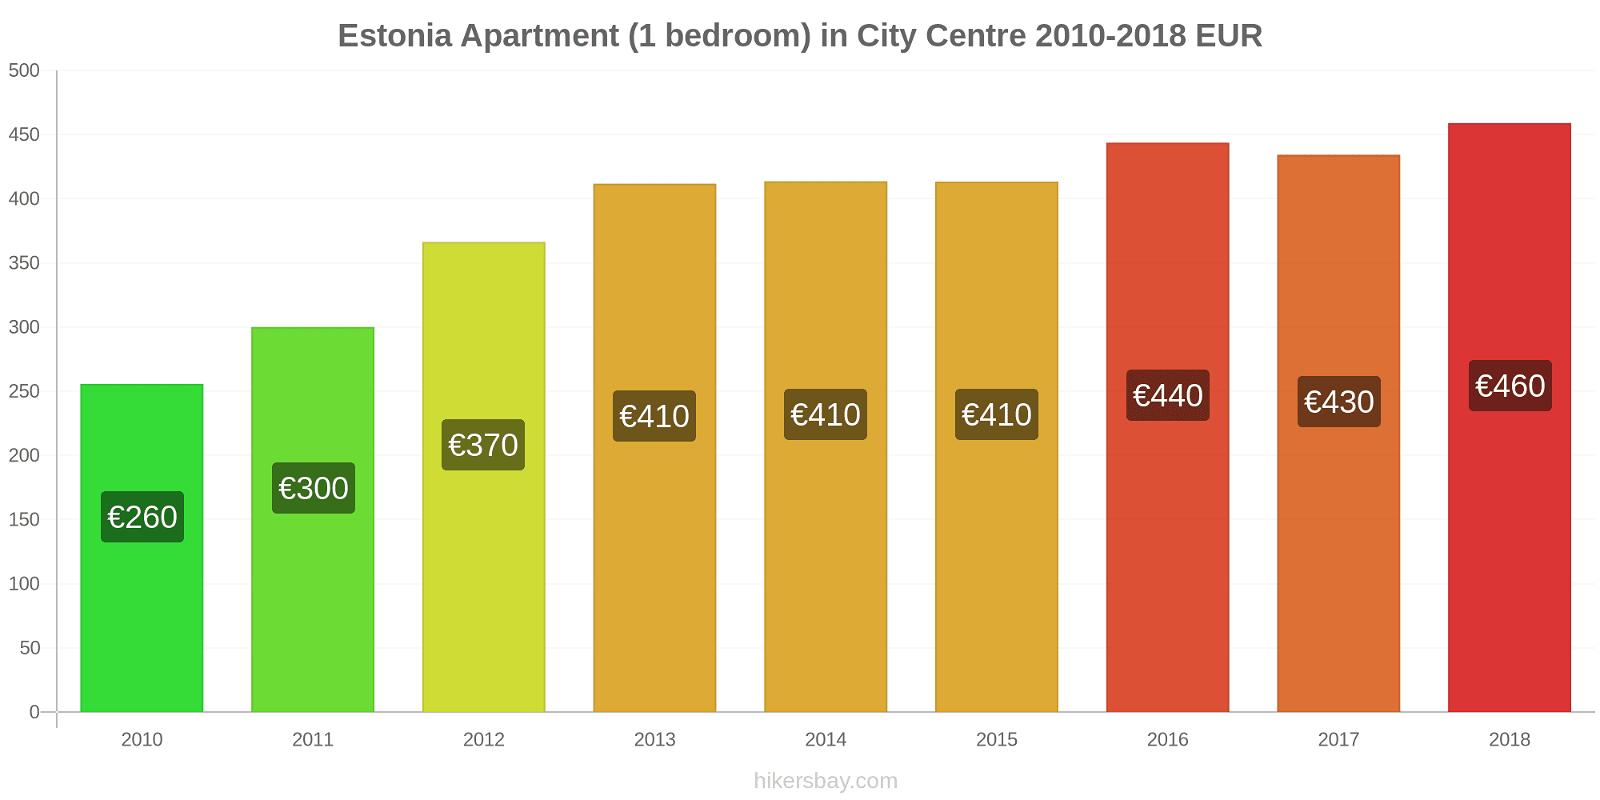 Estonia price changes Apartment (1 bedroom) in City Centre hikersbay.com